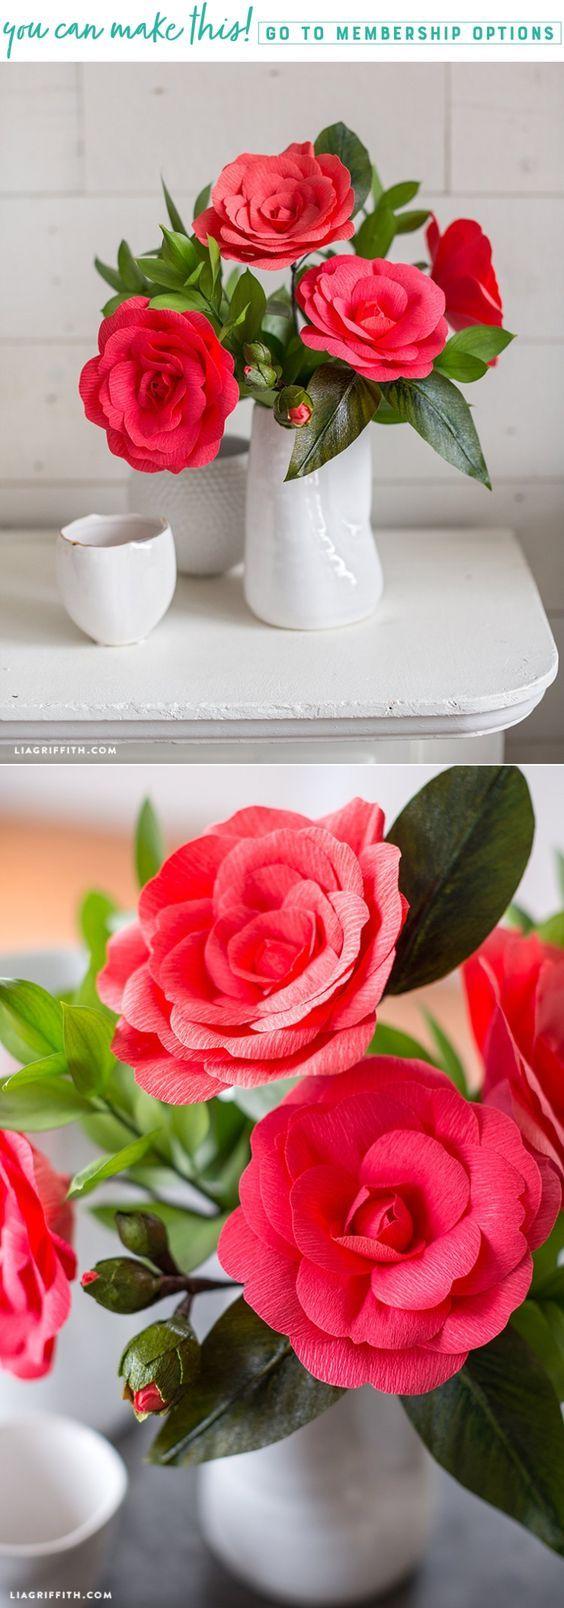 Create a bouquet of beautiful crepe paper camellia flowers - Lia Griffith - www.liagriffith.com #paperart #paperlove #paperflower #paperflowers #crepepaper #crepepaperrevival #crepepaperflowers #diyinspiration #diyidea #diyideas #madewithlia